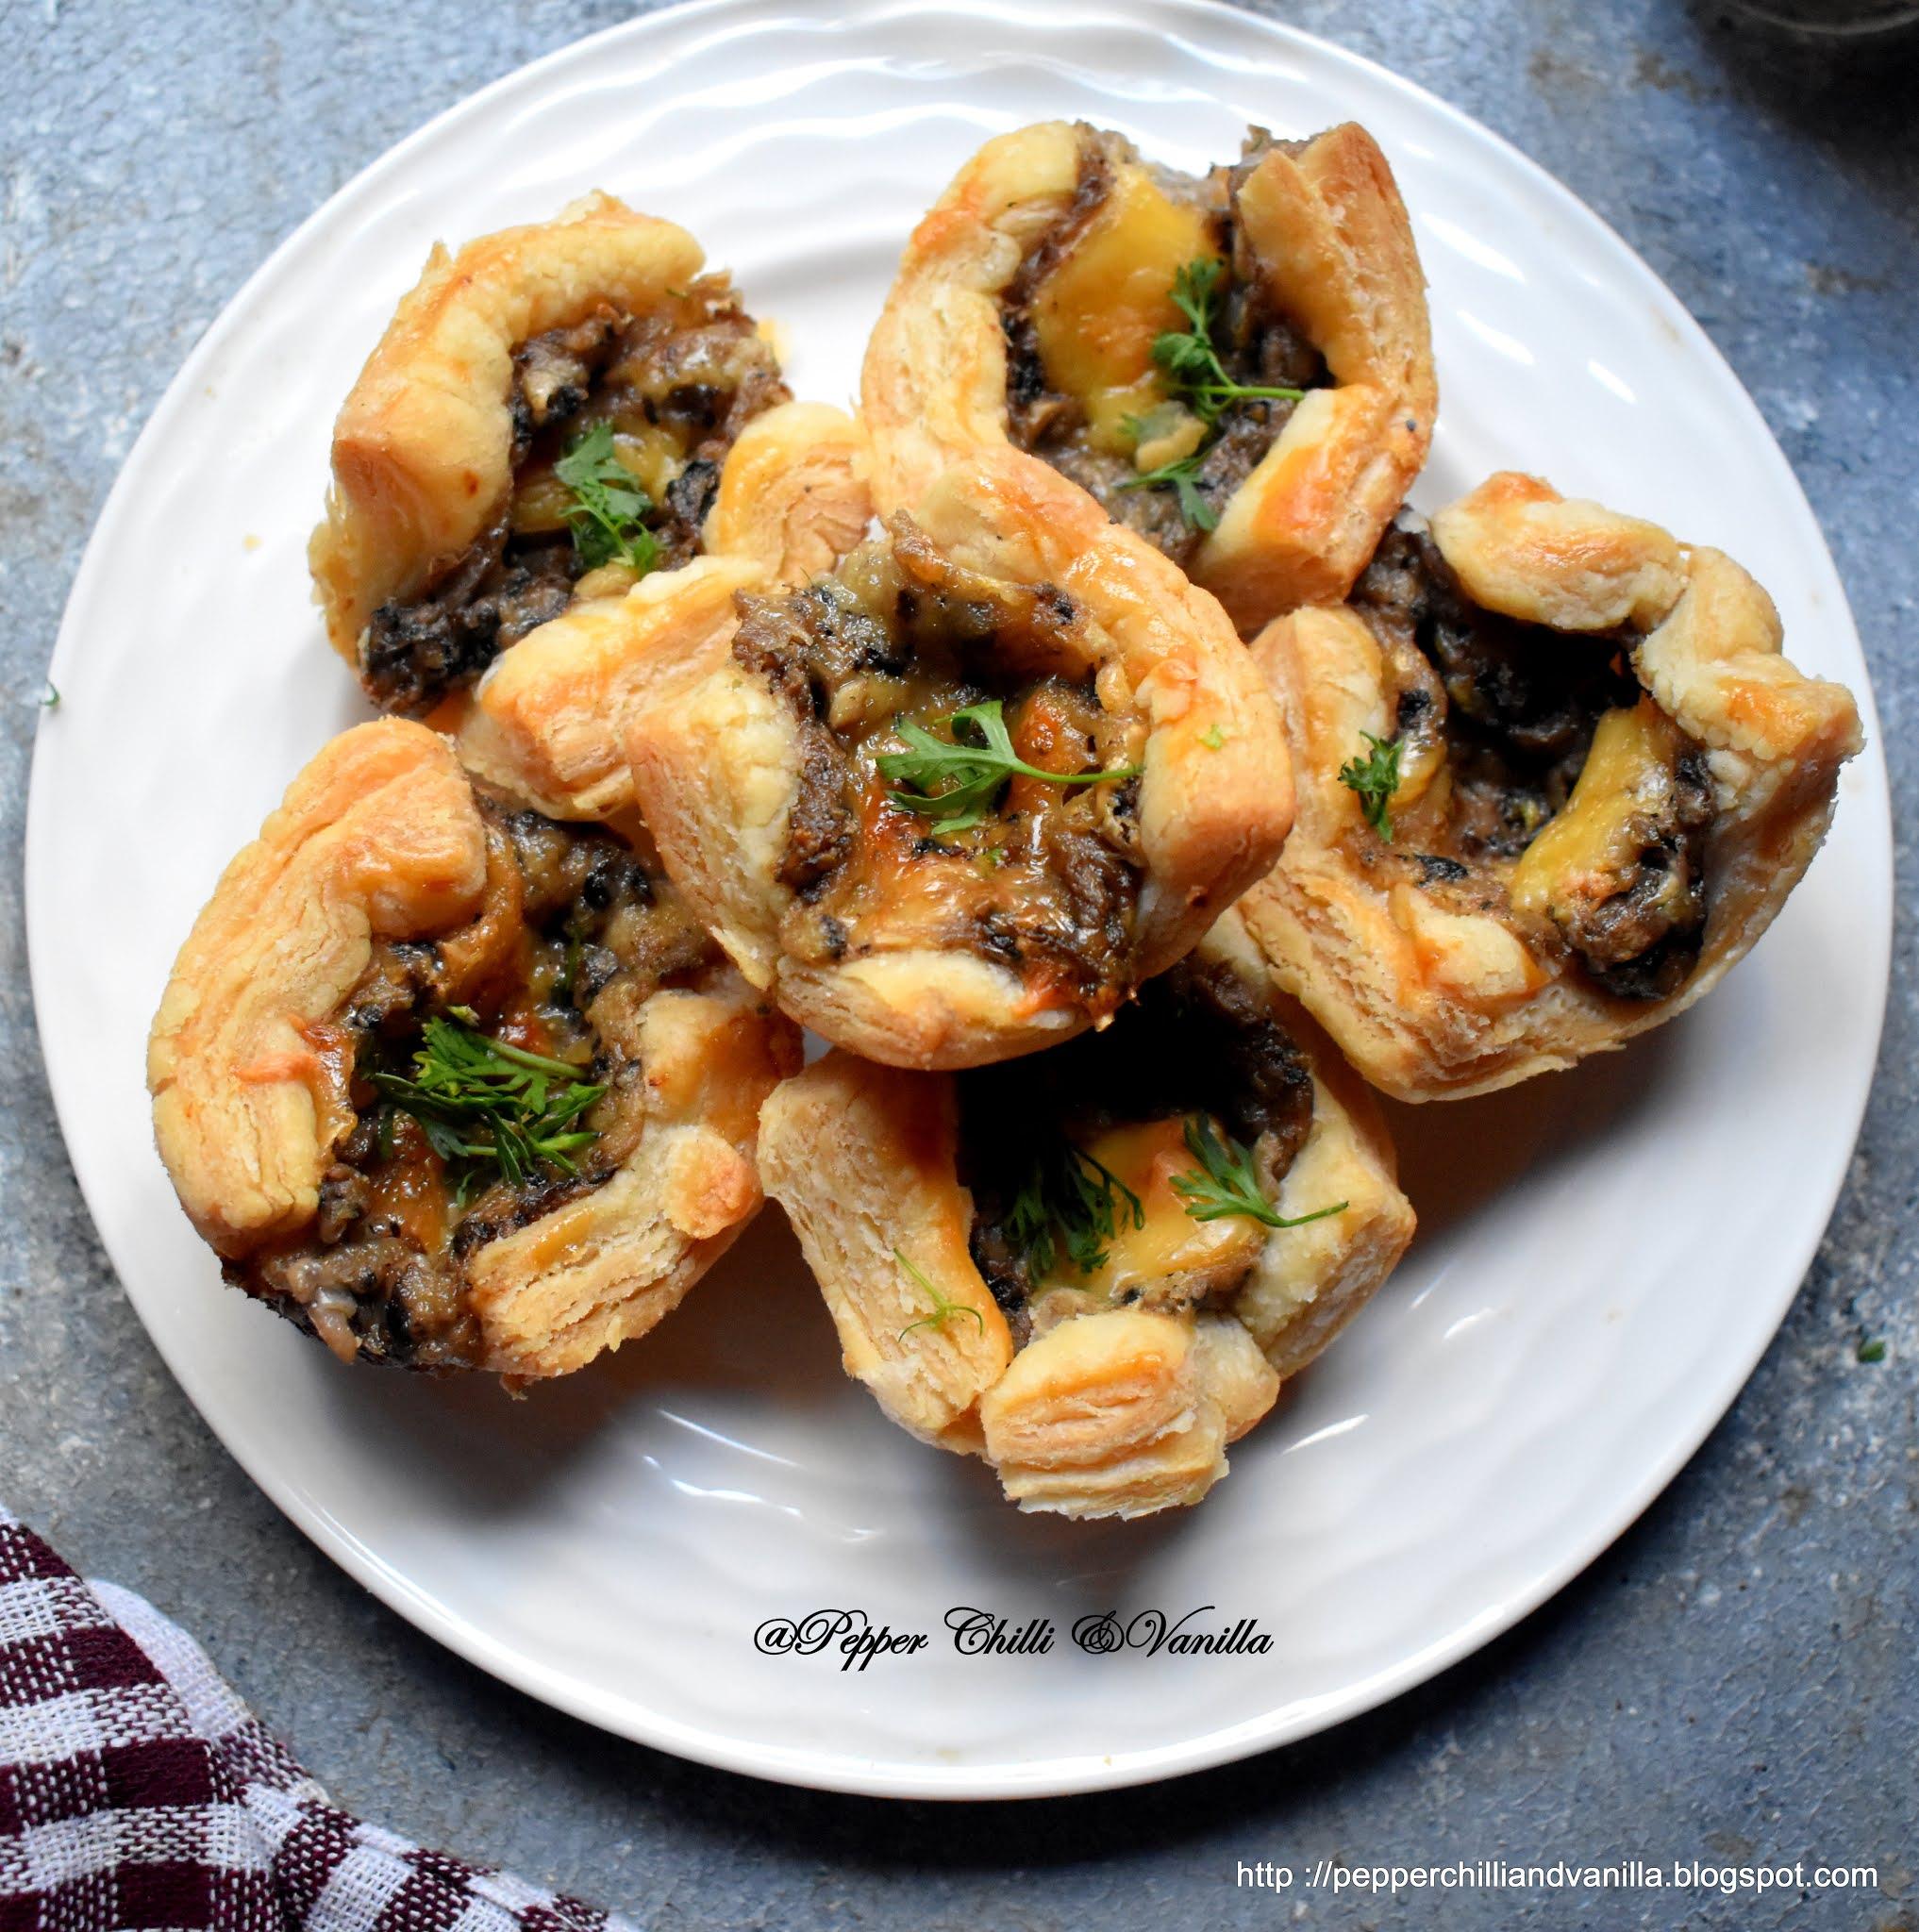 bakery style mushroom puffs,easy homemade mushroom puffs, mushroom pattice